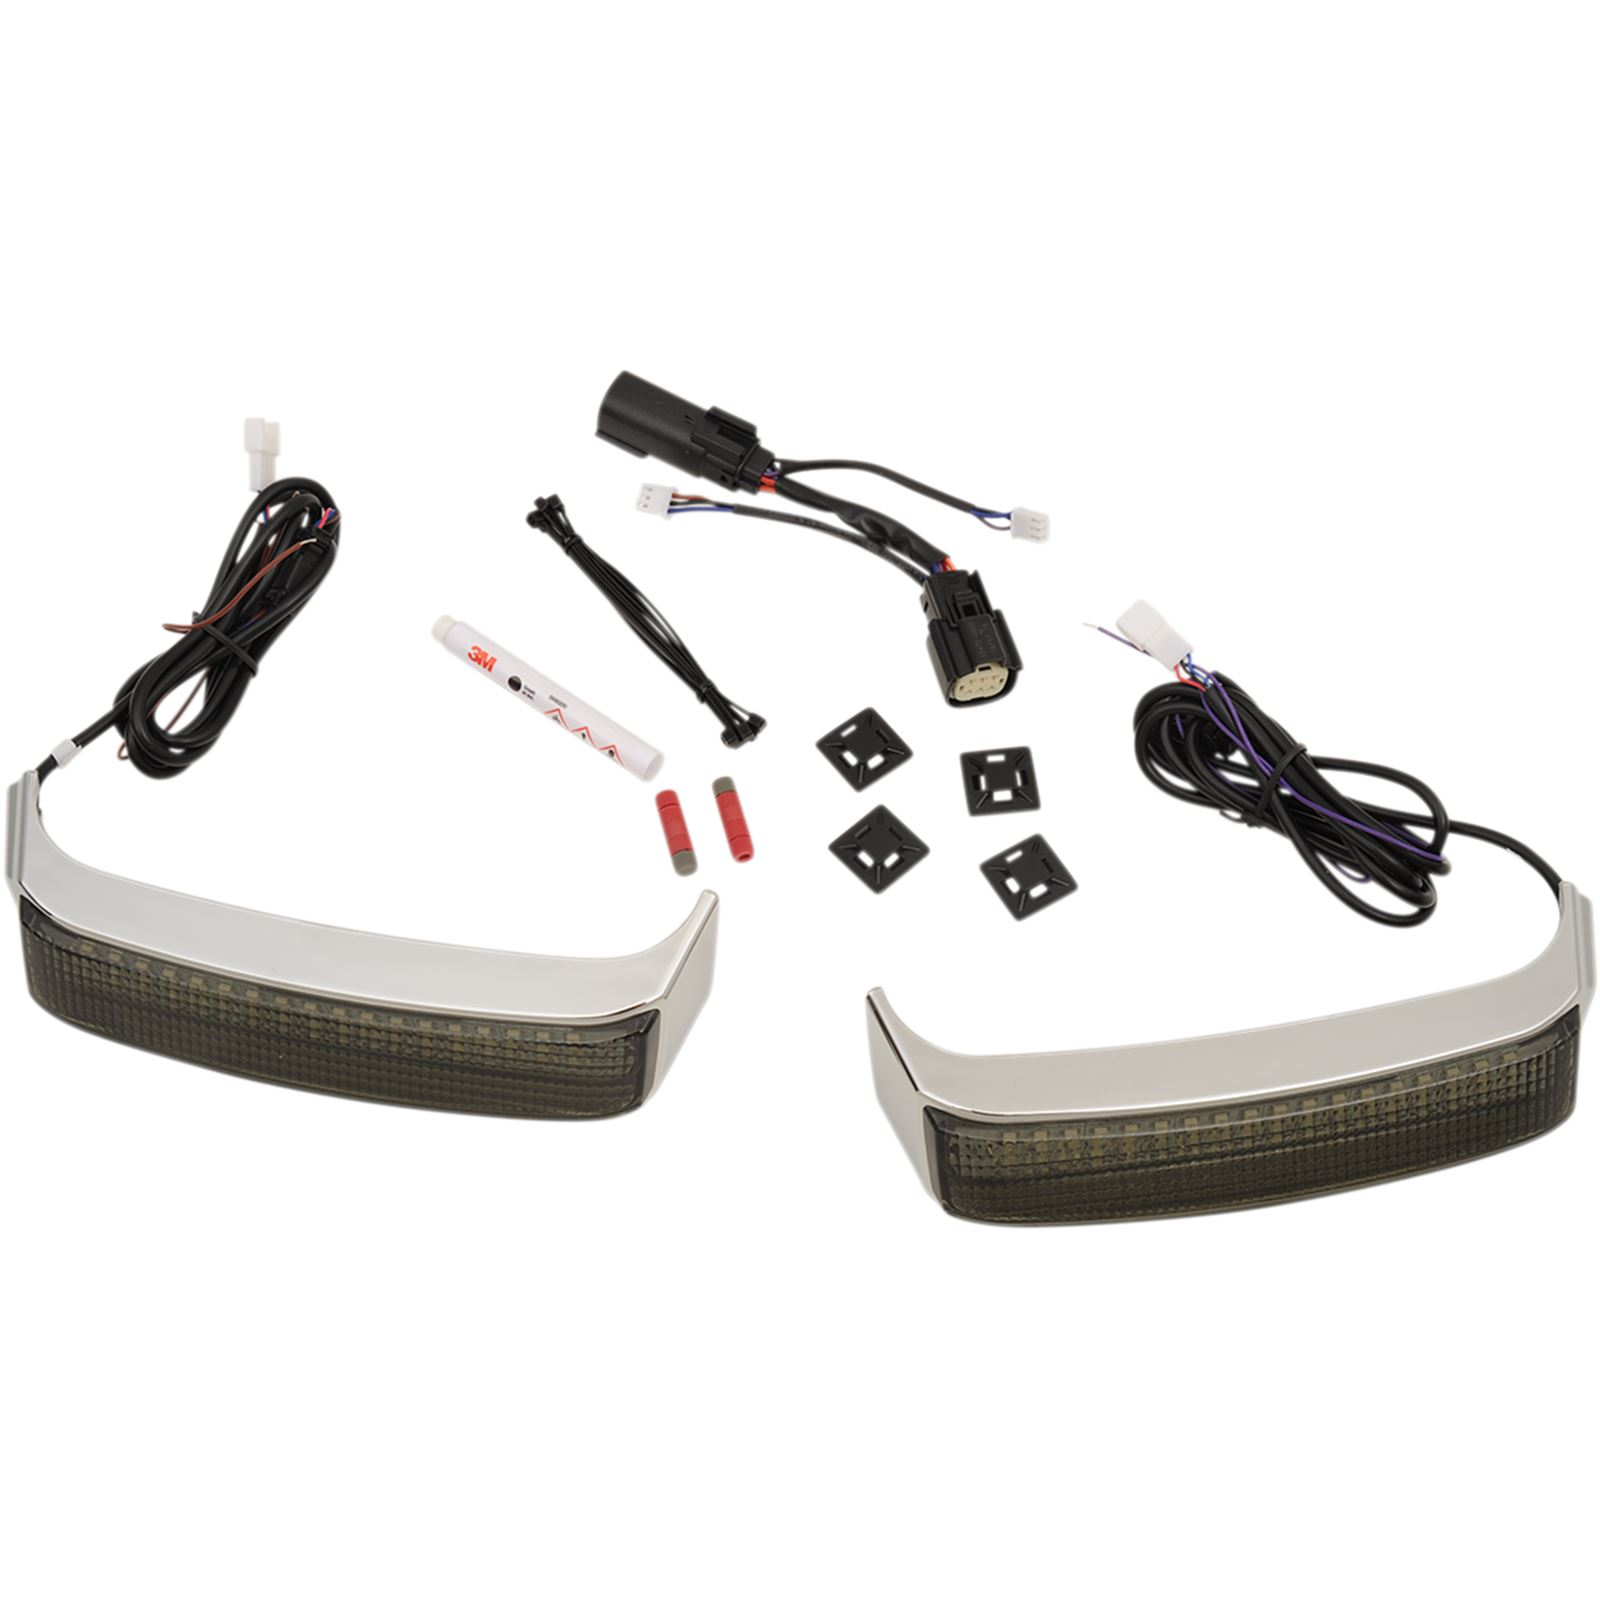 Custom Dynamics Saddlebag Sequential LED Lights - 14+ FLHT/R/X FLTRX/U - Chrome/Smoke